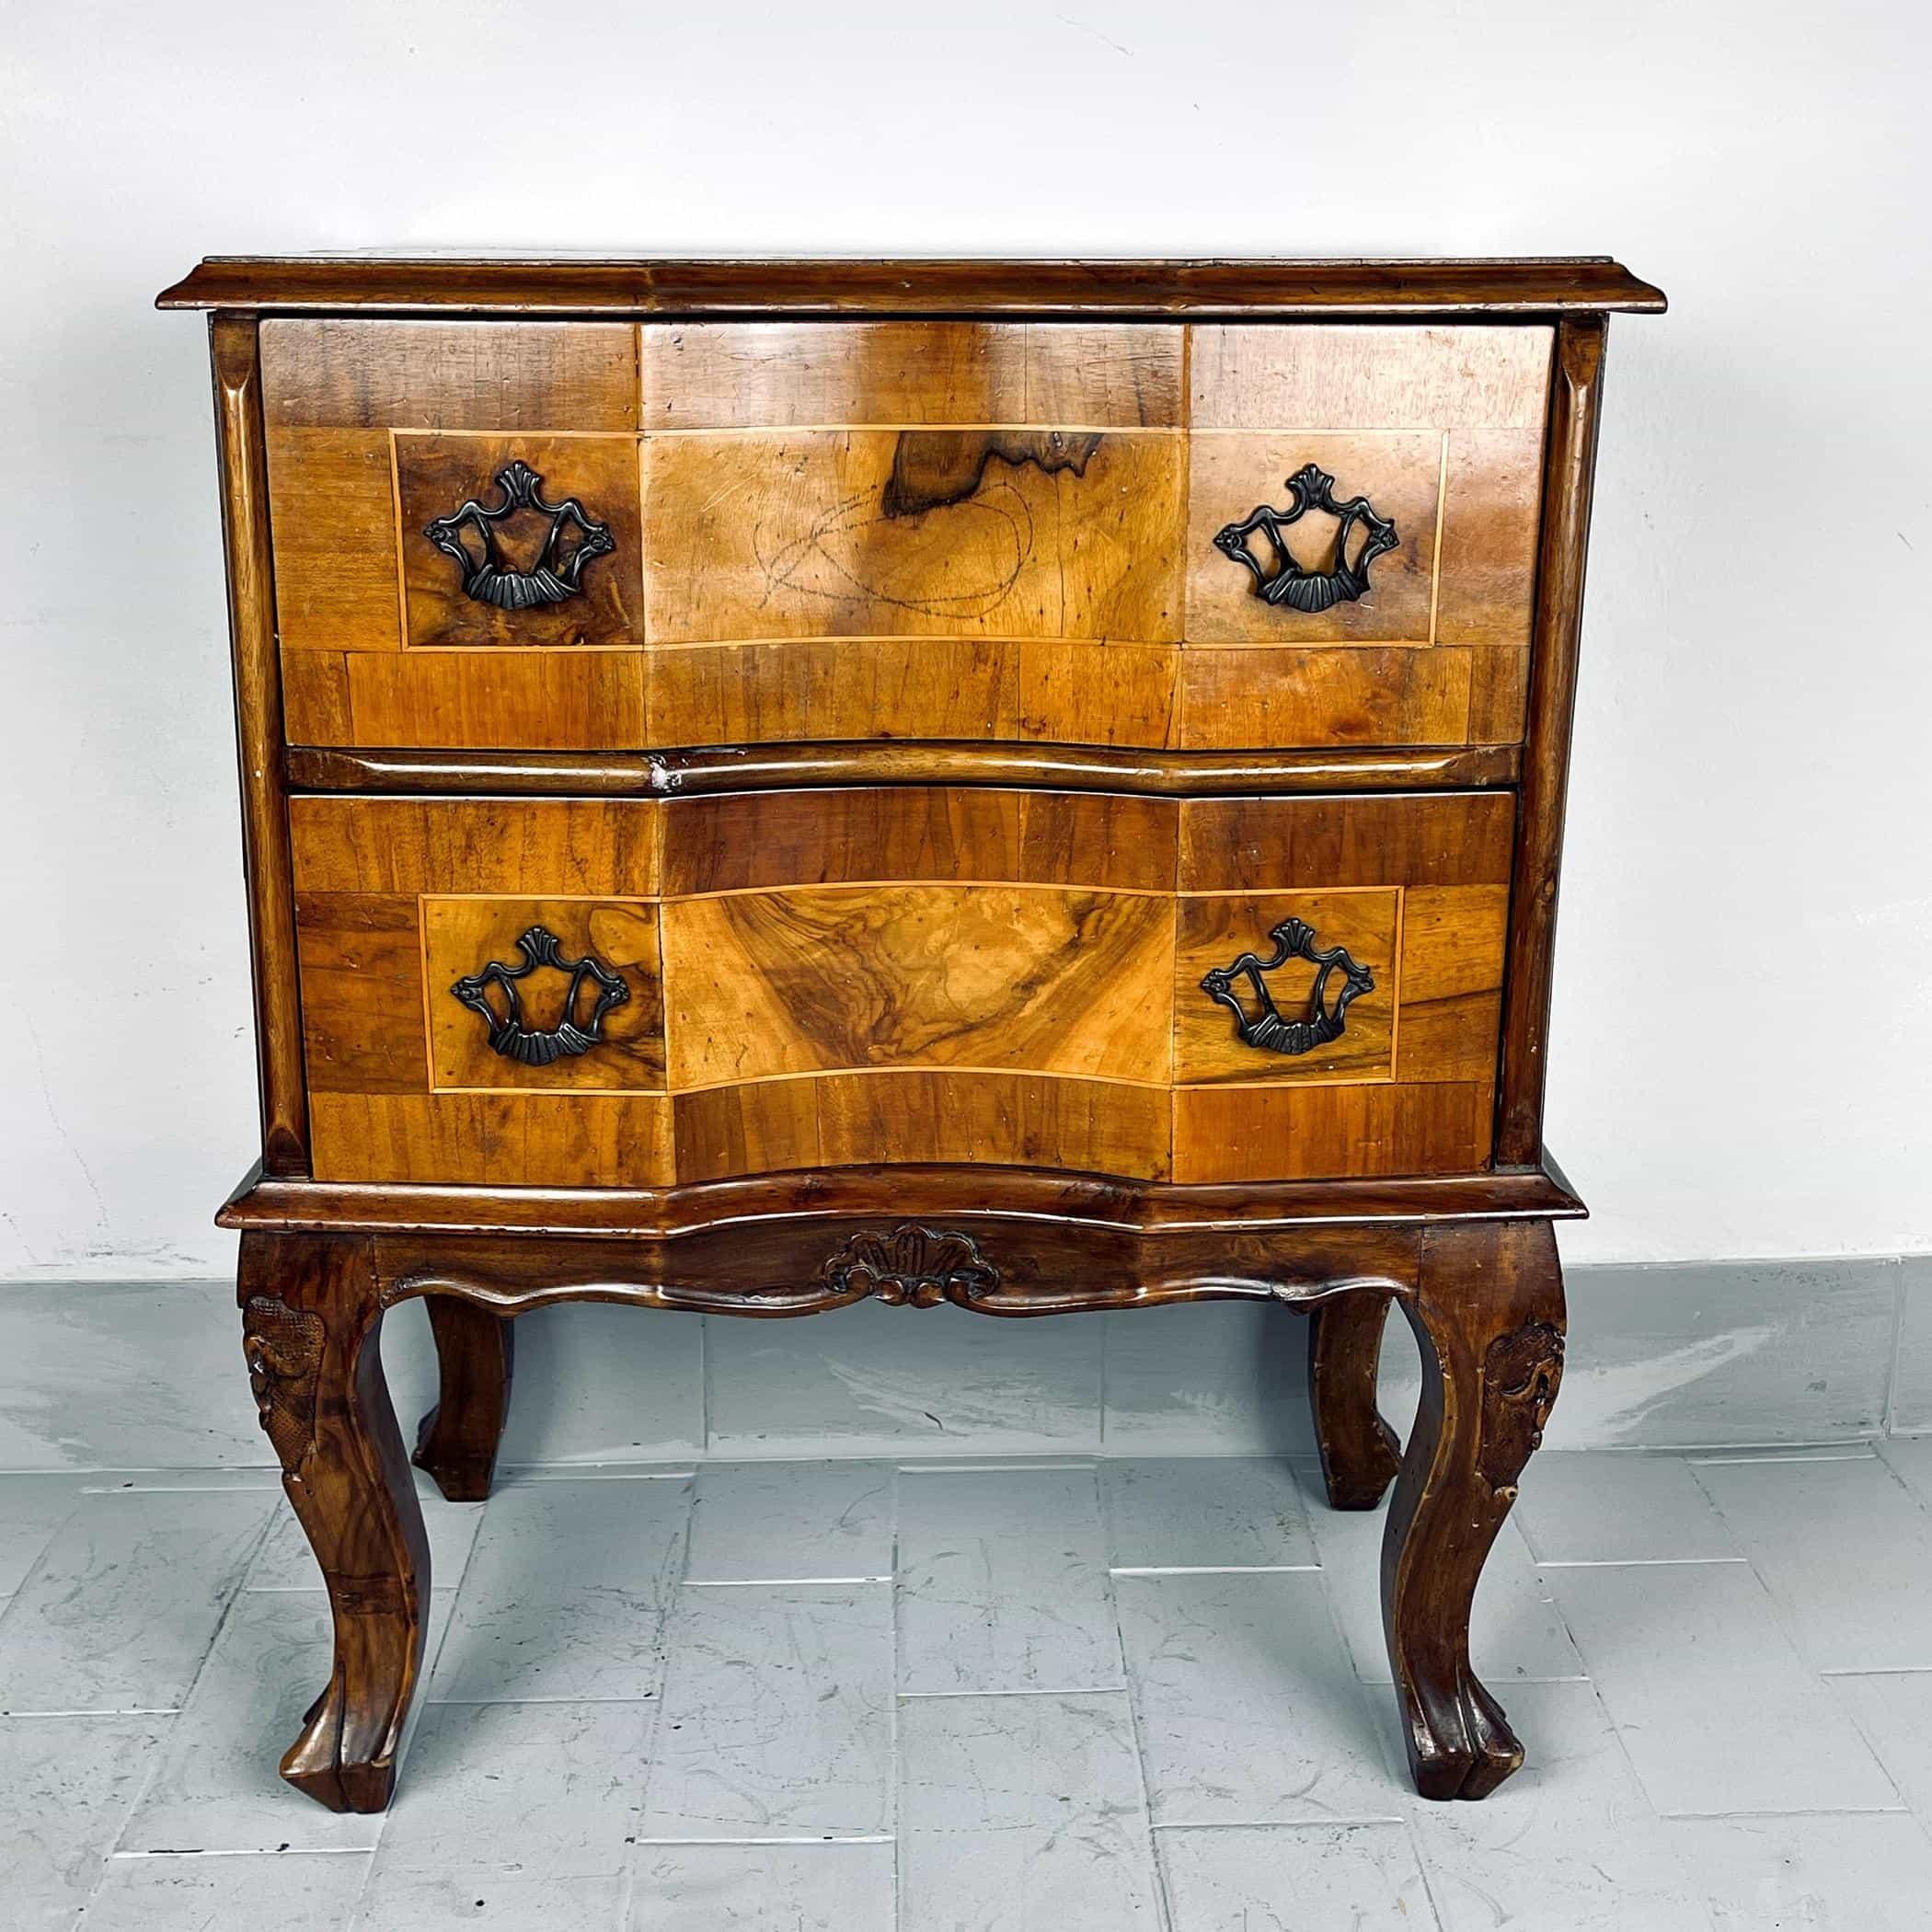 Vintage wood bedside Italy 1950s venetian wooden nightstands table